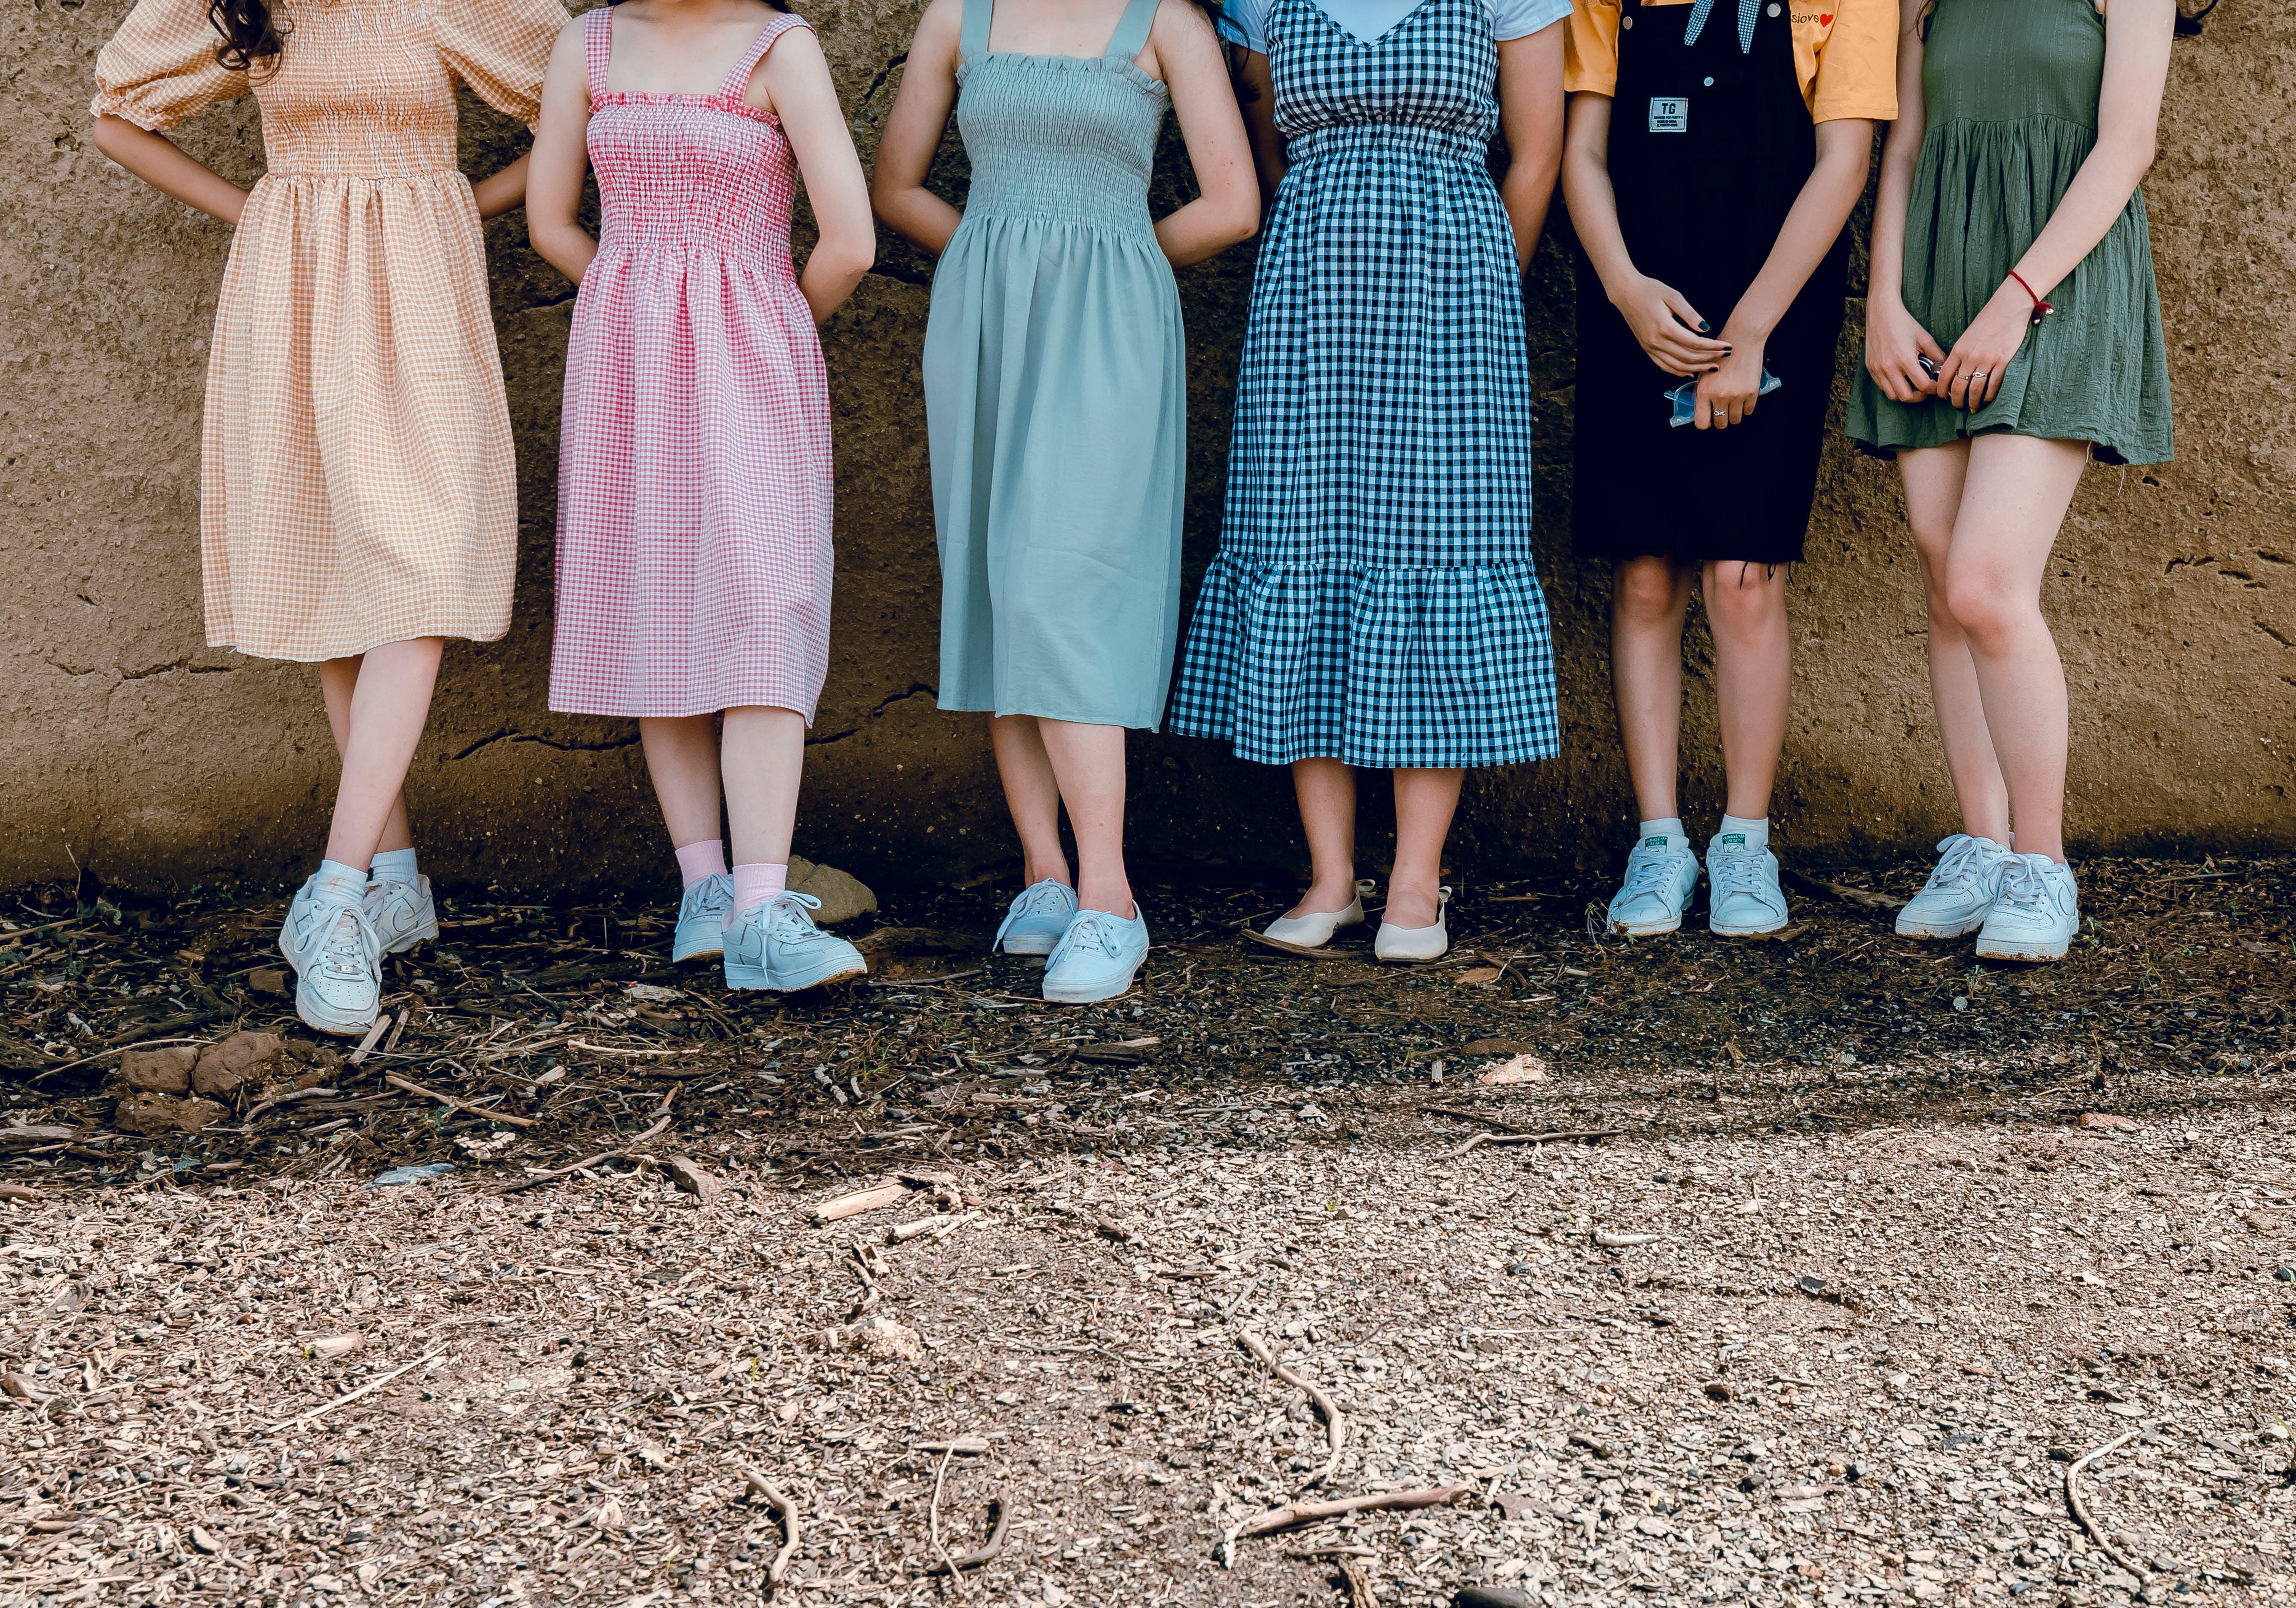 Kostenloses Stock Foto zu erwachsener, familie, fashion, frau